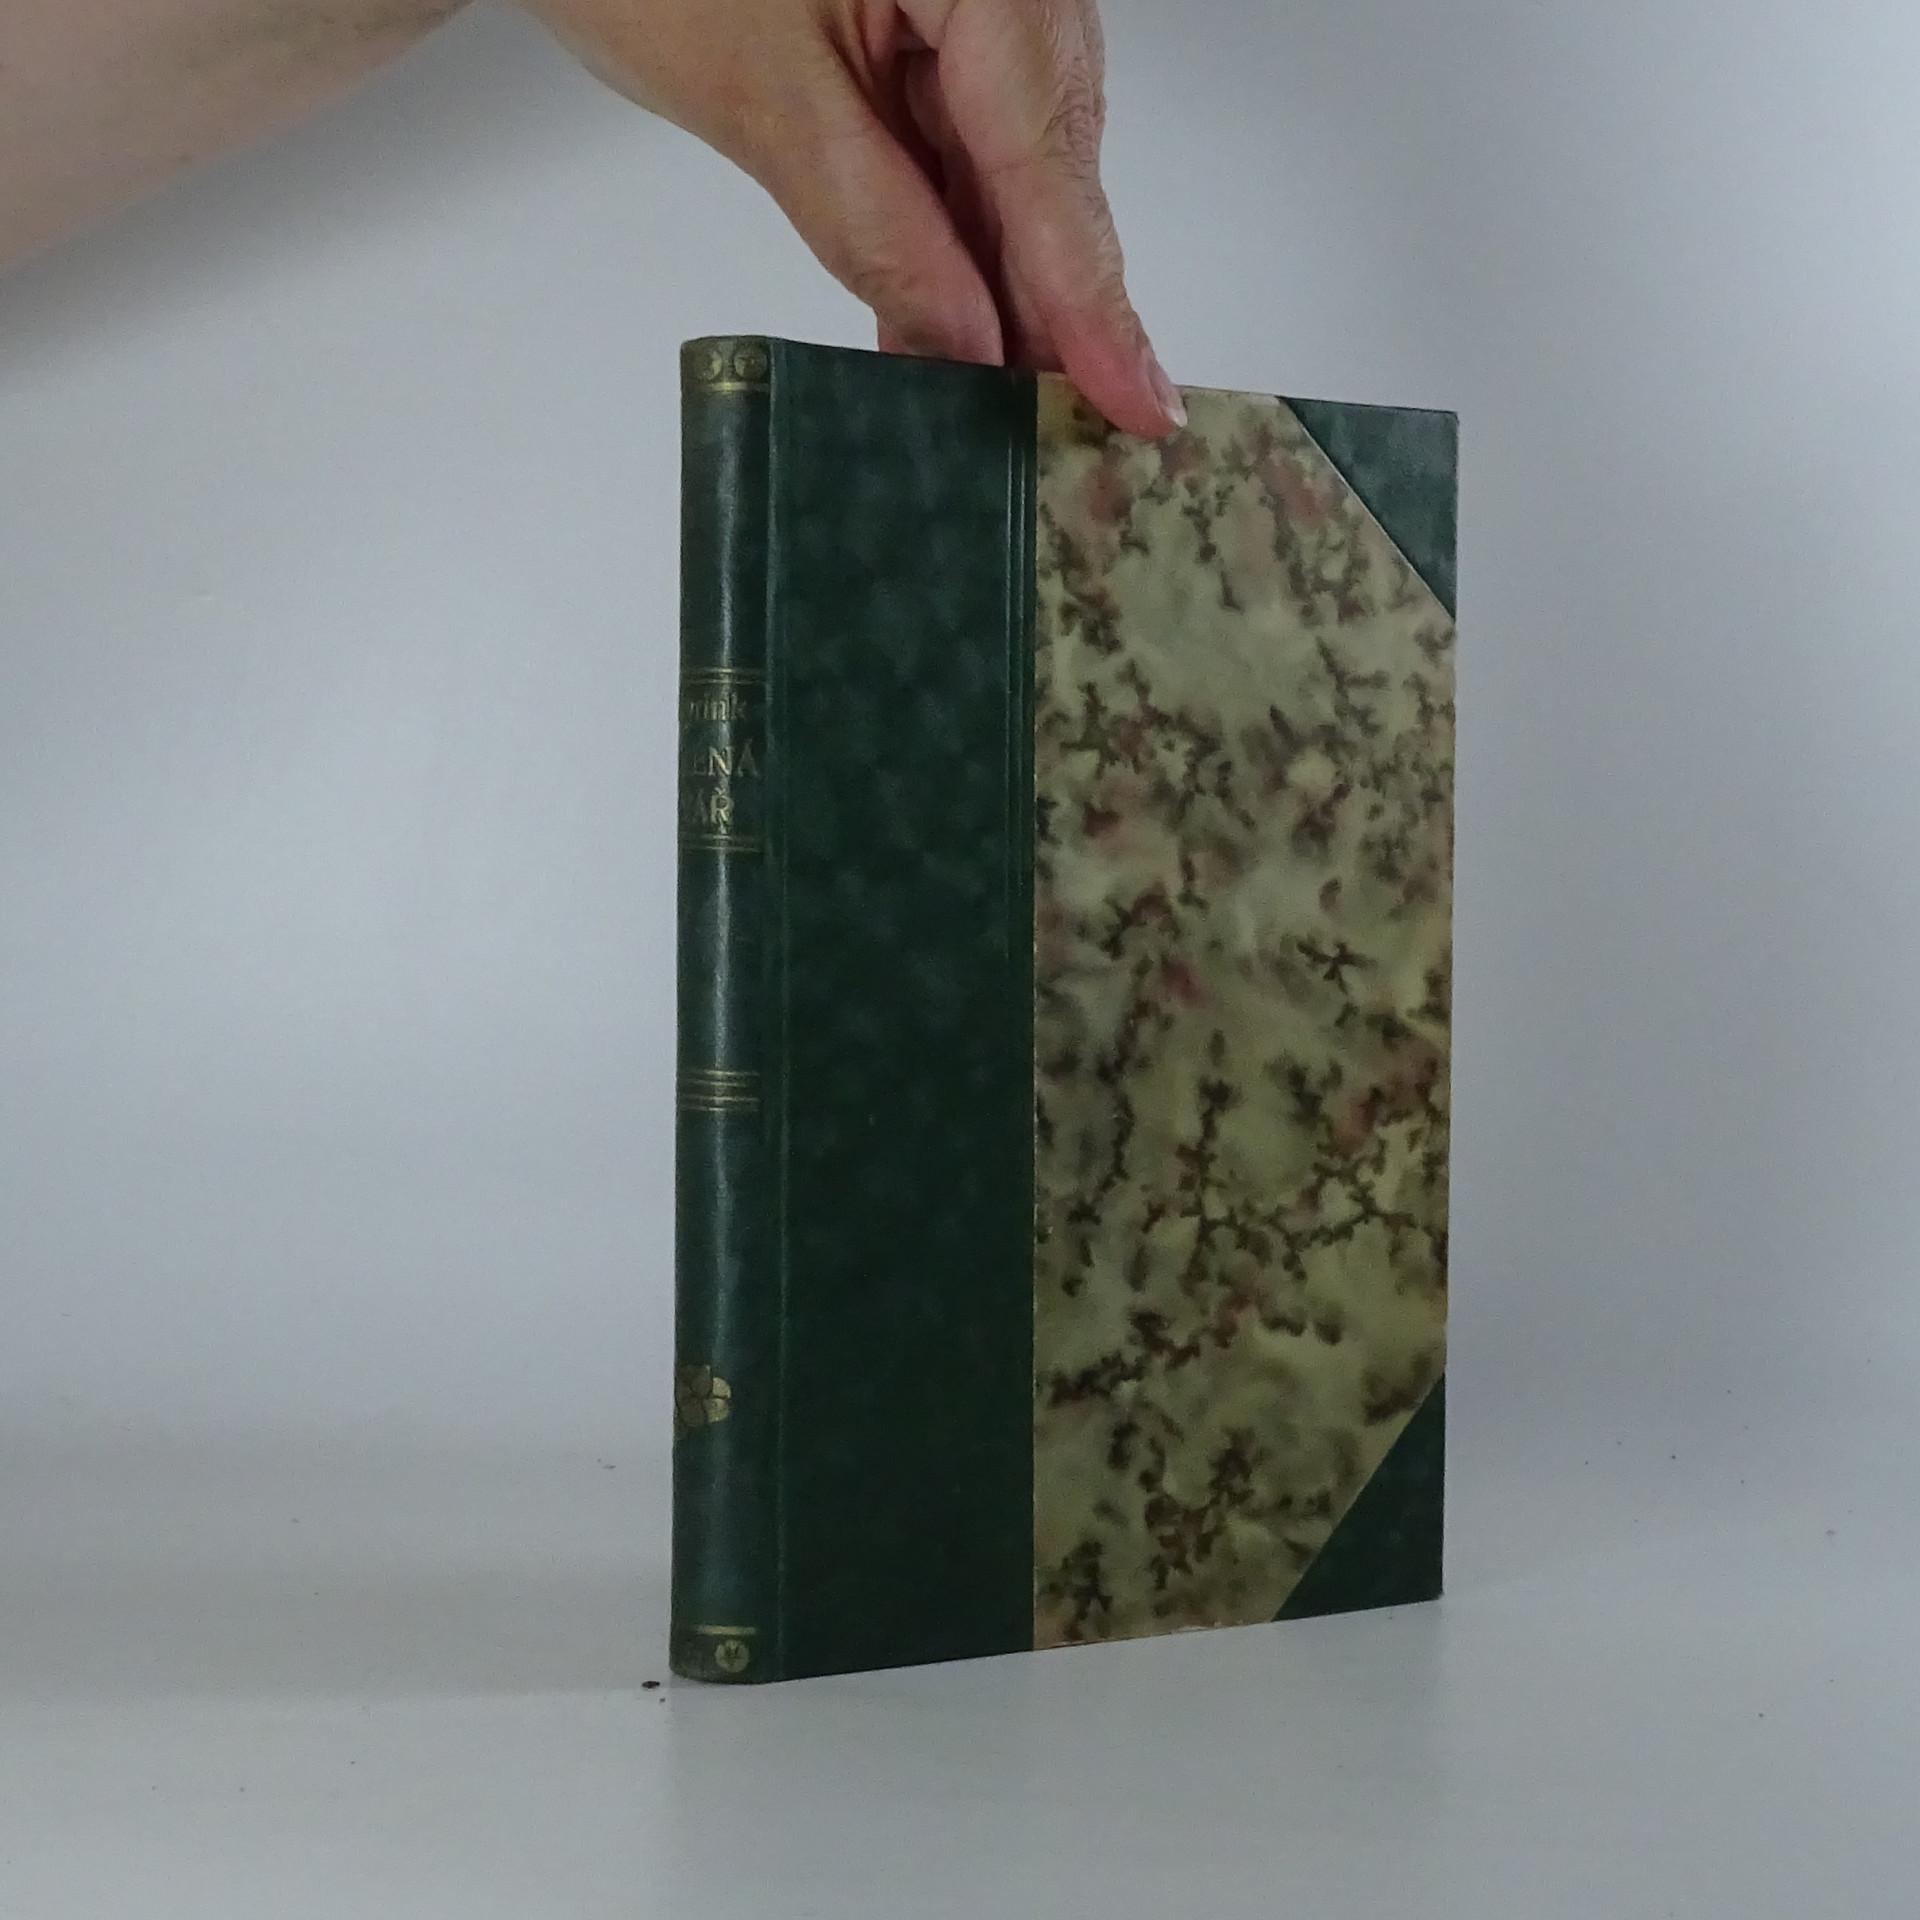 antikvární kniha Zelená tvář. Román, 1925